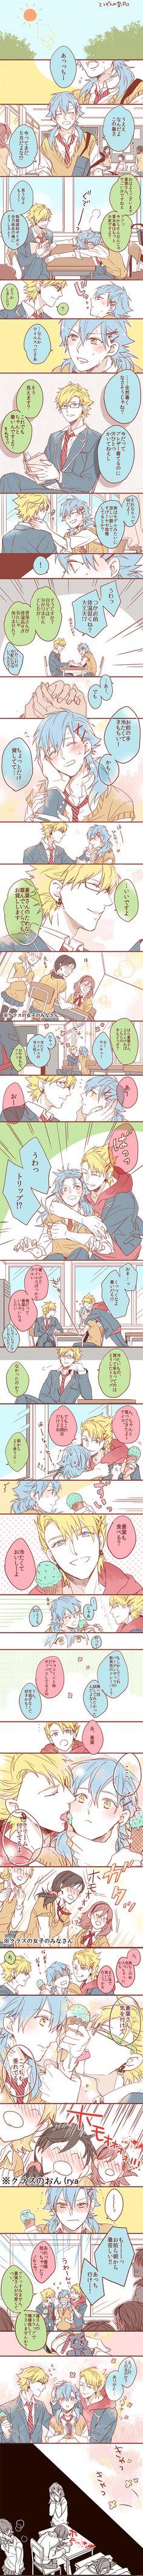 DRAMAtical Murder - dmmd - Trip - Virus - Aoba - High School AU .////.